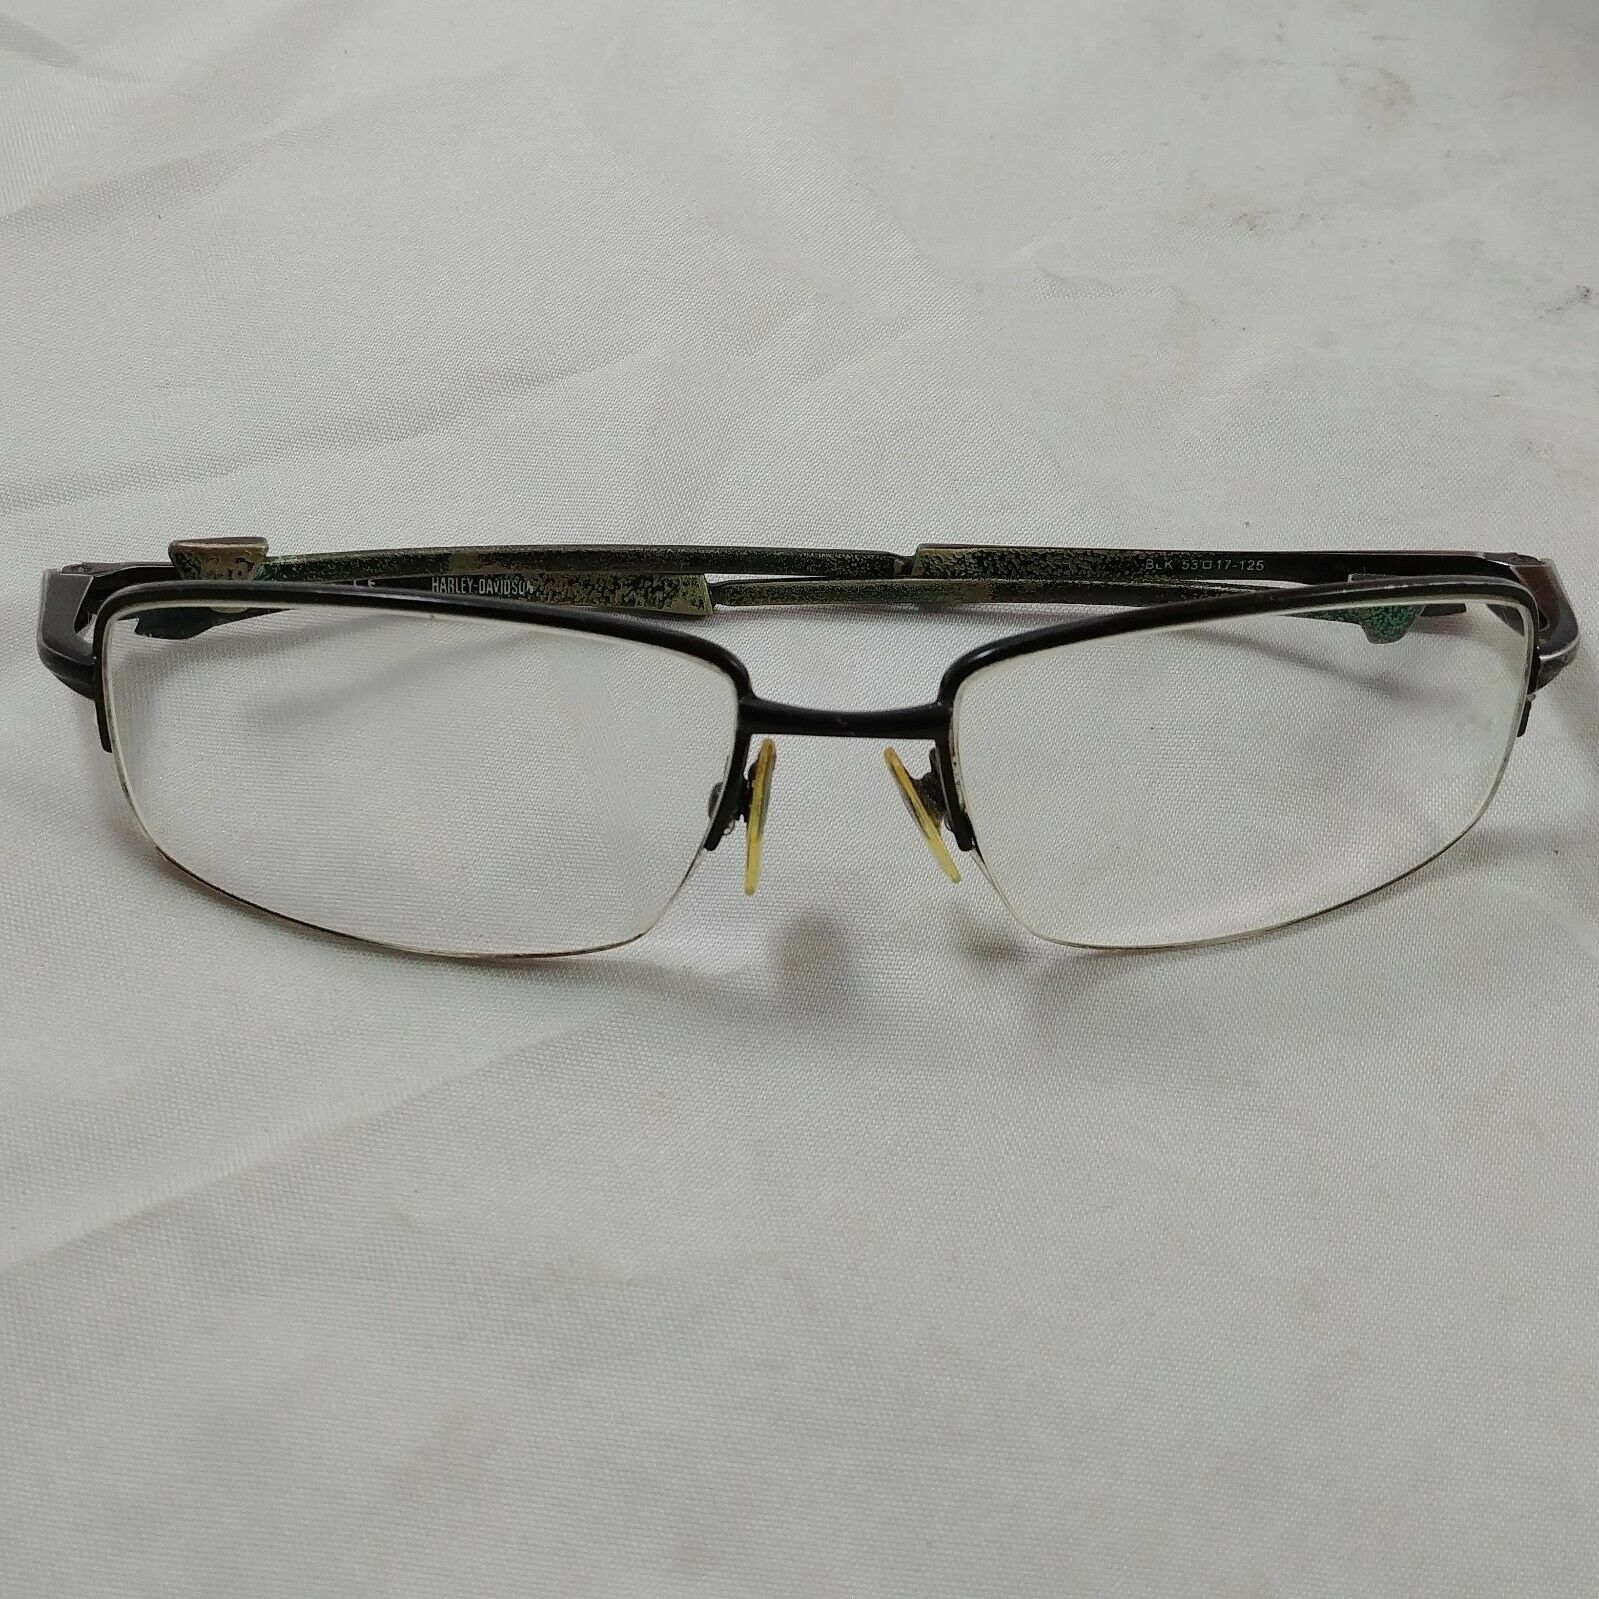 13efc85b98fda Vintage Black Prescription Eyeglasses Half Rim Harley Davidson 53-17 ...